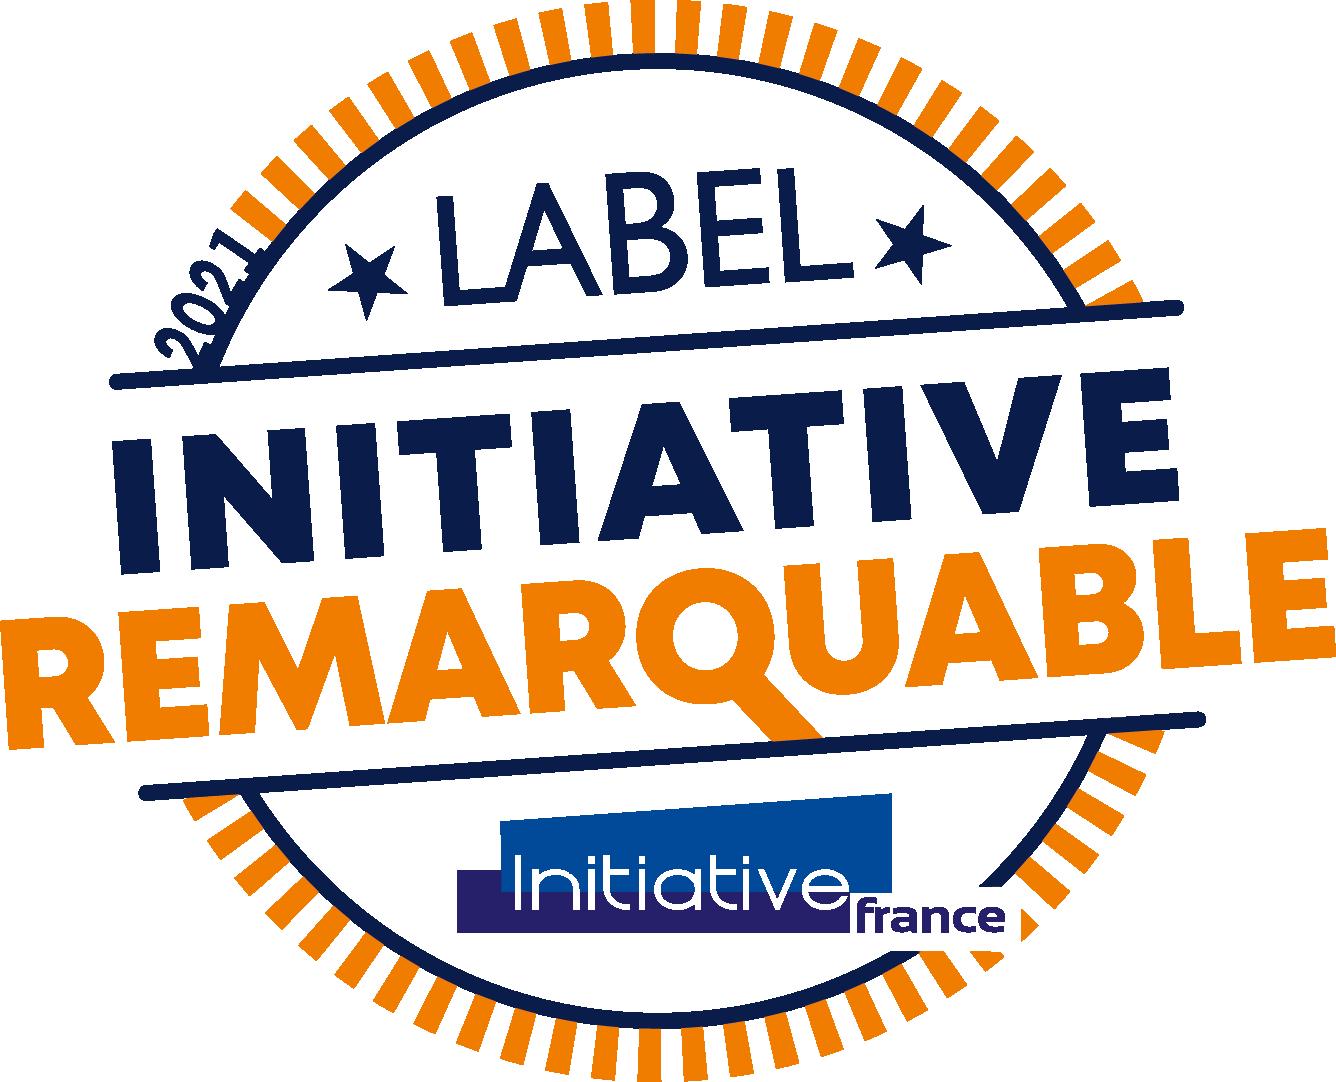 Entreprise Initiative Remarquable